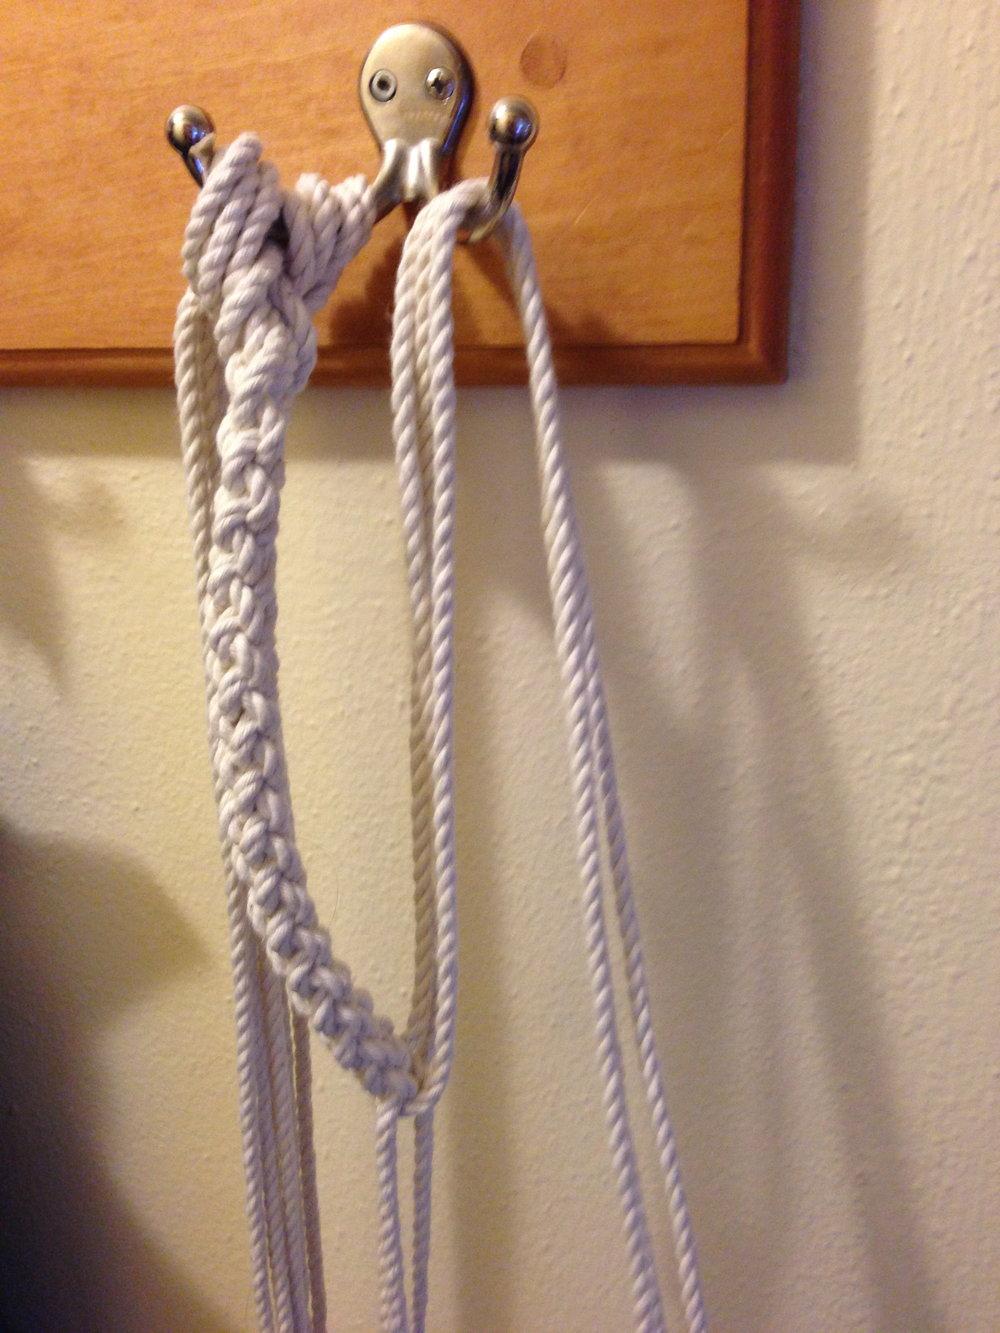 6-strand braid